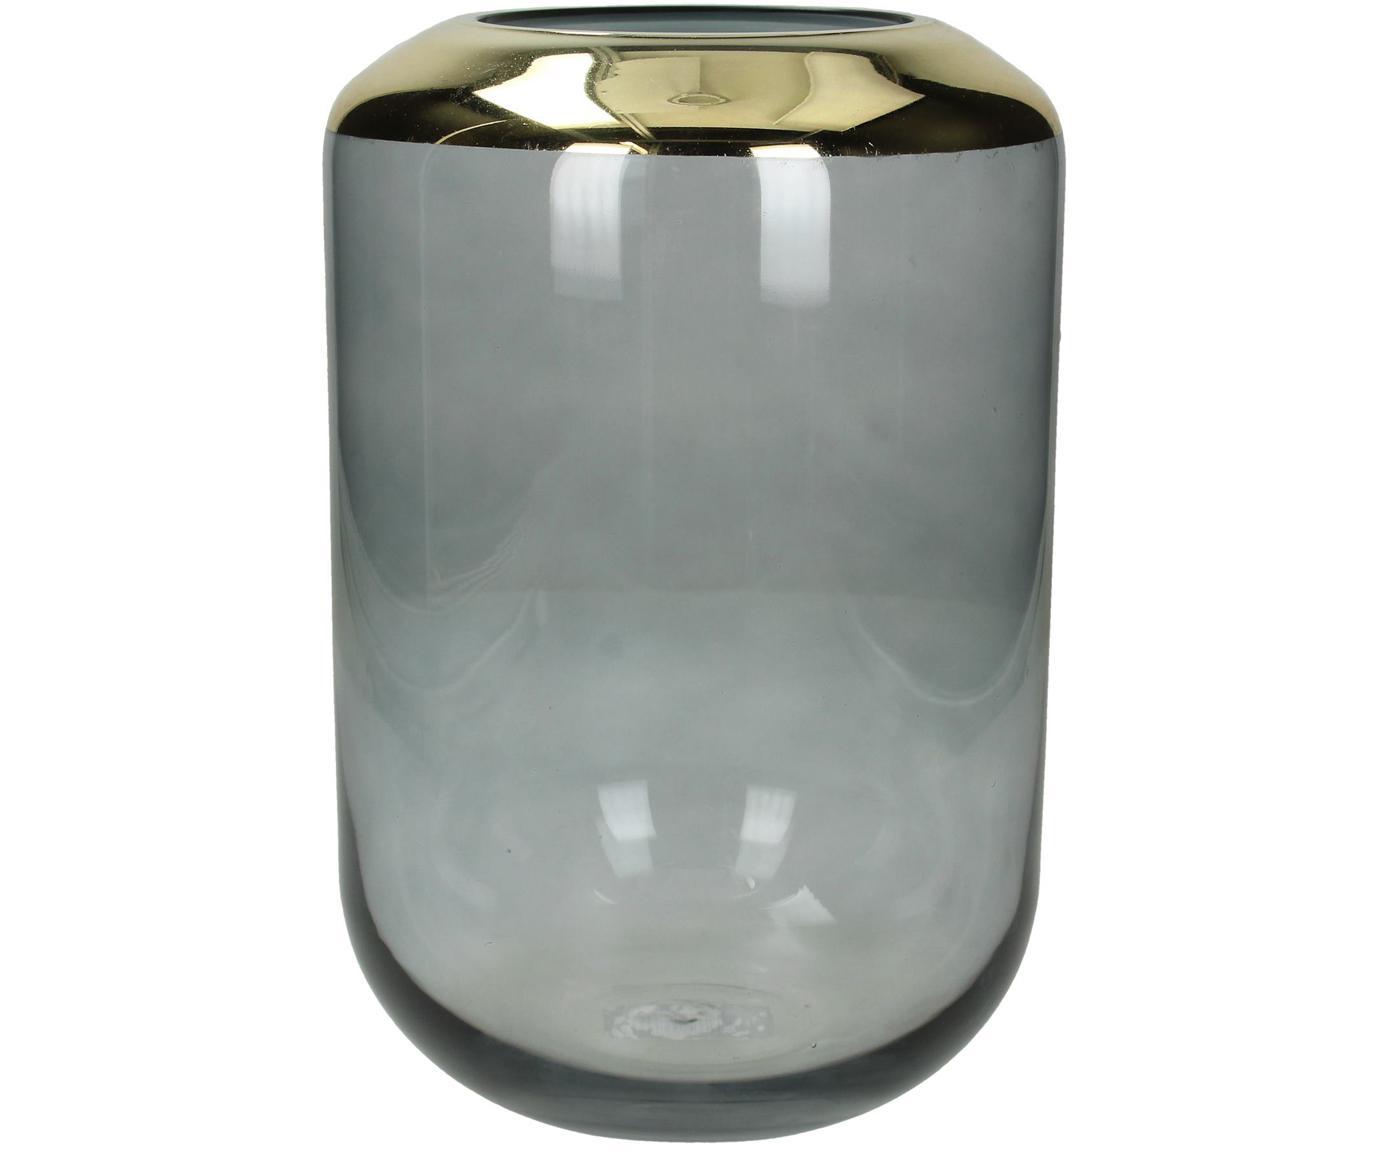 Glazen vaas Janak, Glas, Grijs, transparant, goudkleurig, Ø 16 x H 25 cm